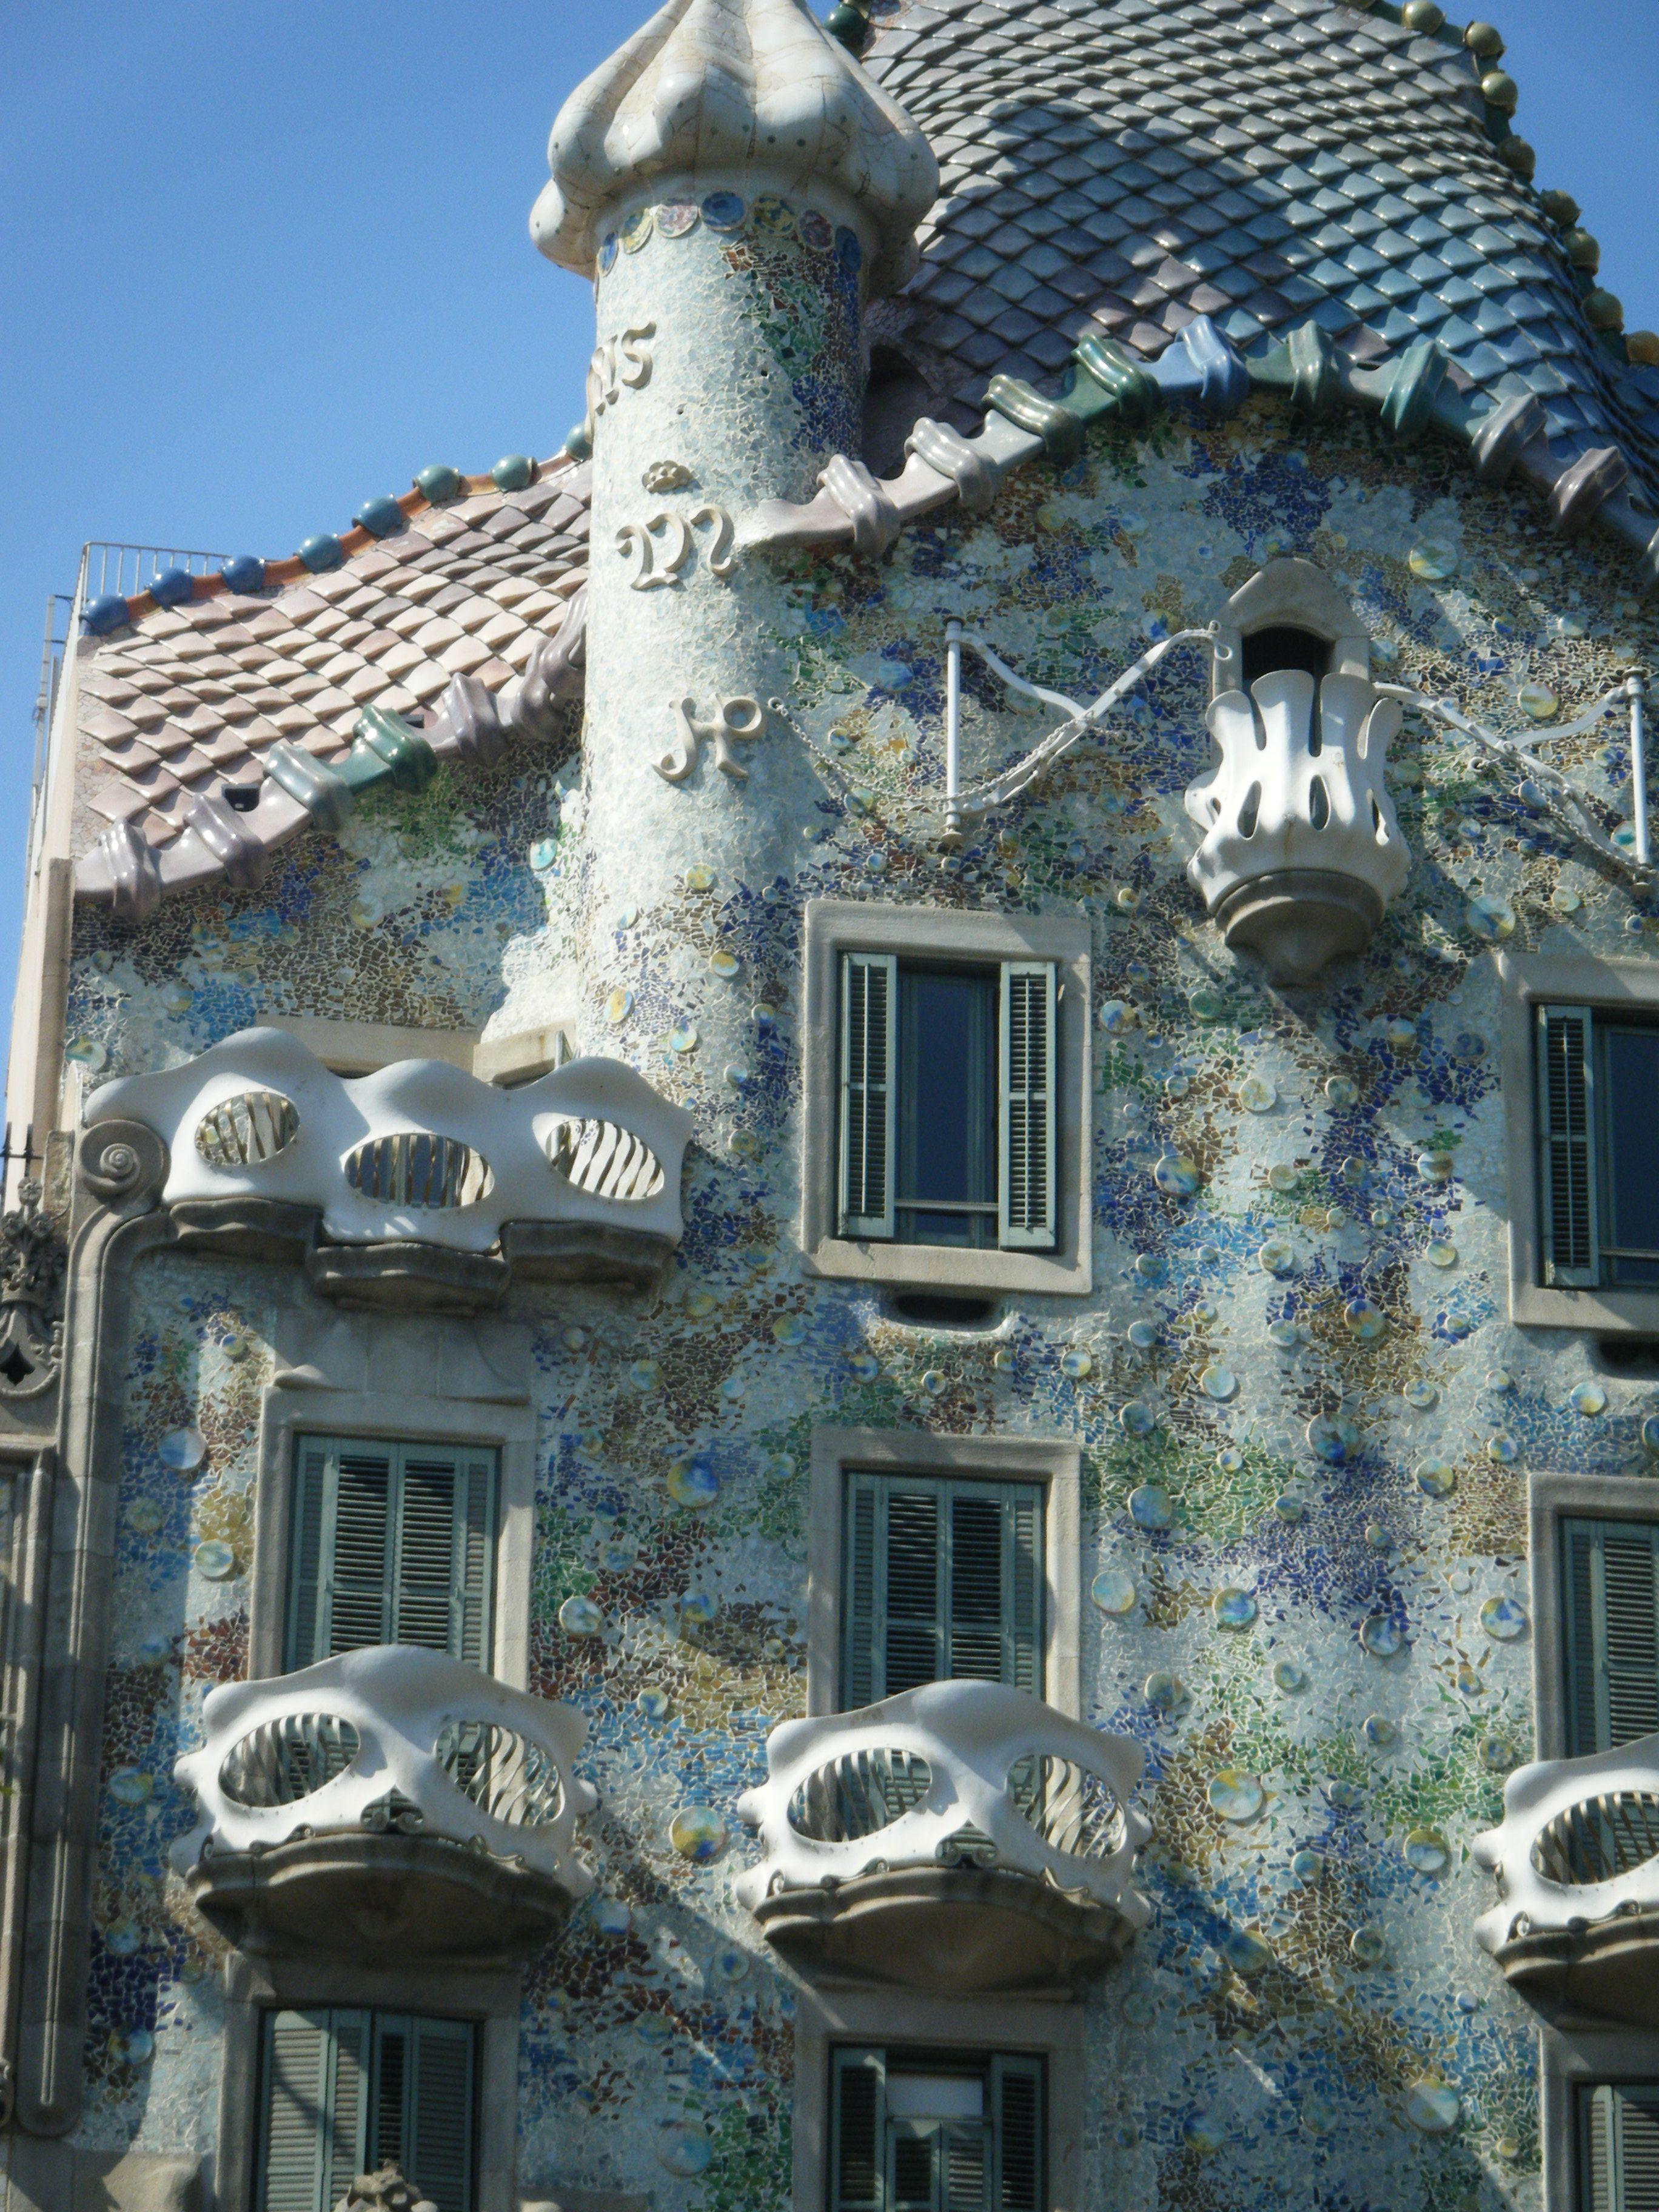 amazing gaudi architecture in barcelona antonio gaudi pinterest. Black Bedroom Furniture Sets. Home Design Ideas